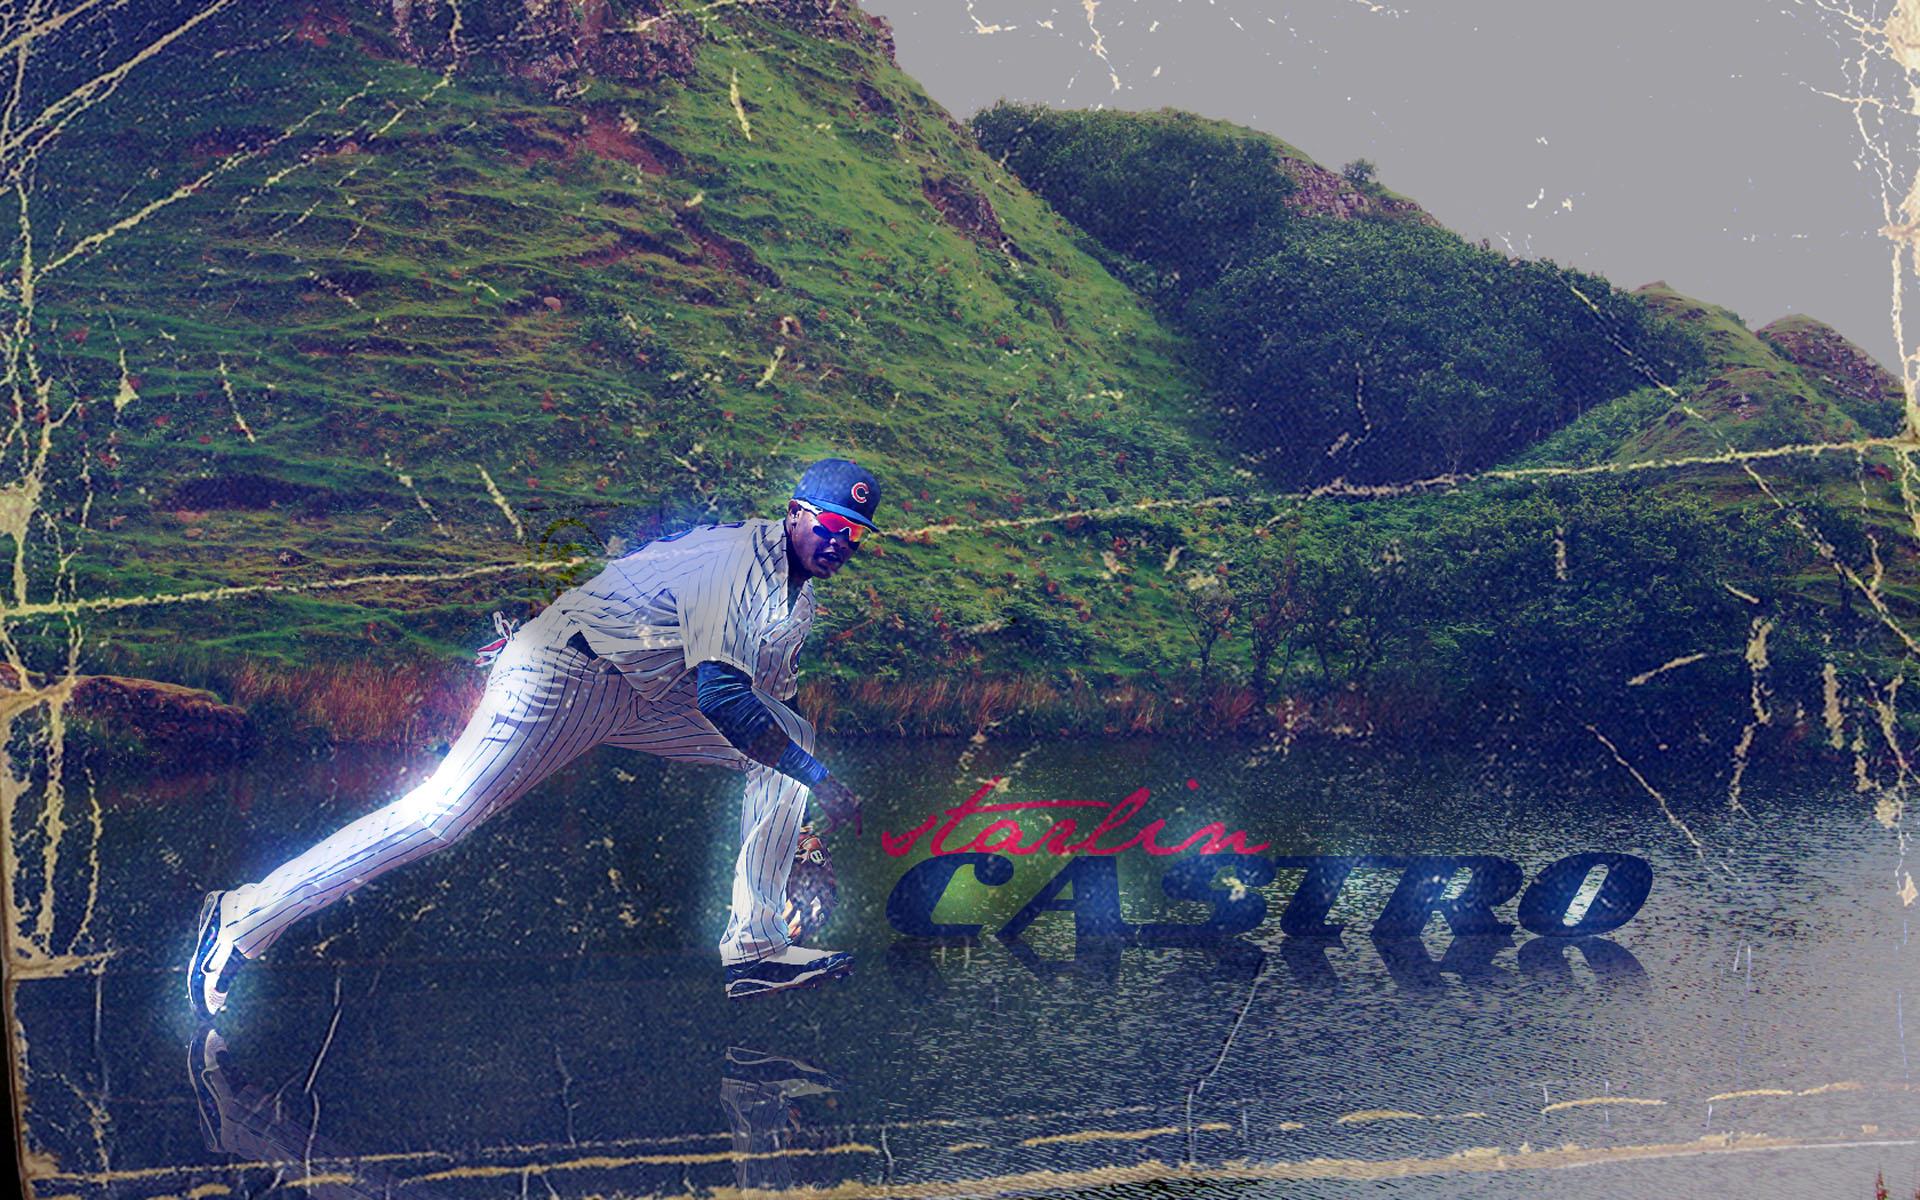 CHICAGO CUBS mlb baseball 42 wallpaper 1920x1200 232555 1920x1200